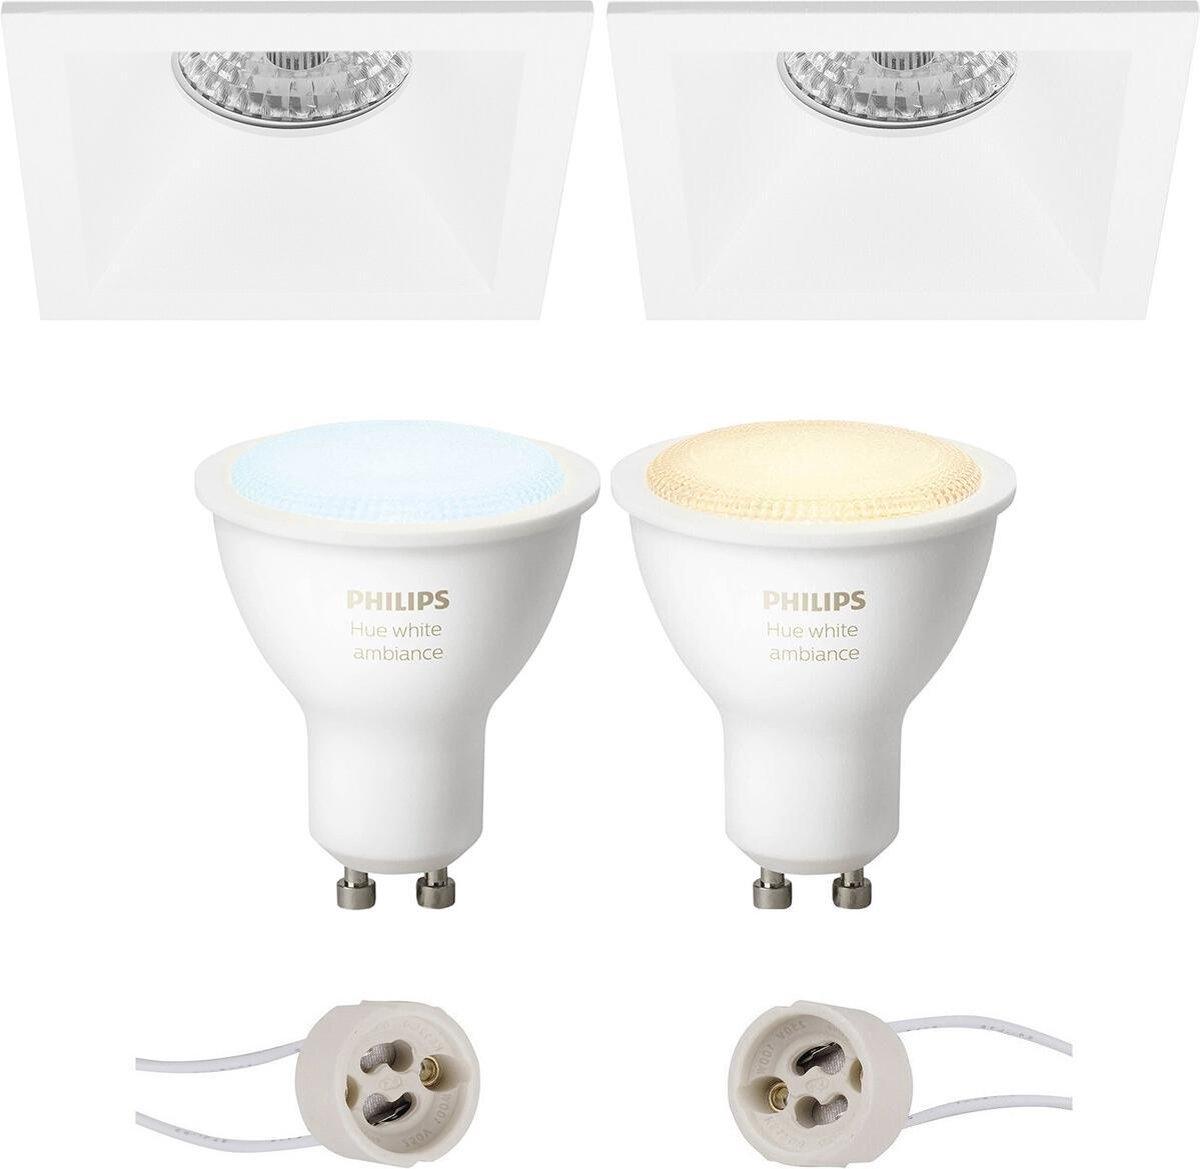 PHILIPS HUE - LED Spot Set GU10 - White Ambiance - Bluetooth - Proma Pollon Pro - Inbouw Vierkant - Mat Wit - Verdiept - 82mm